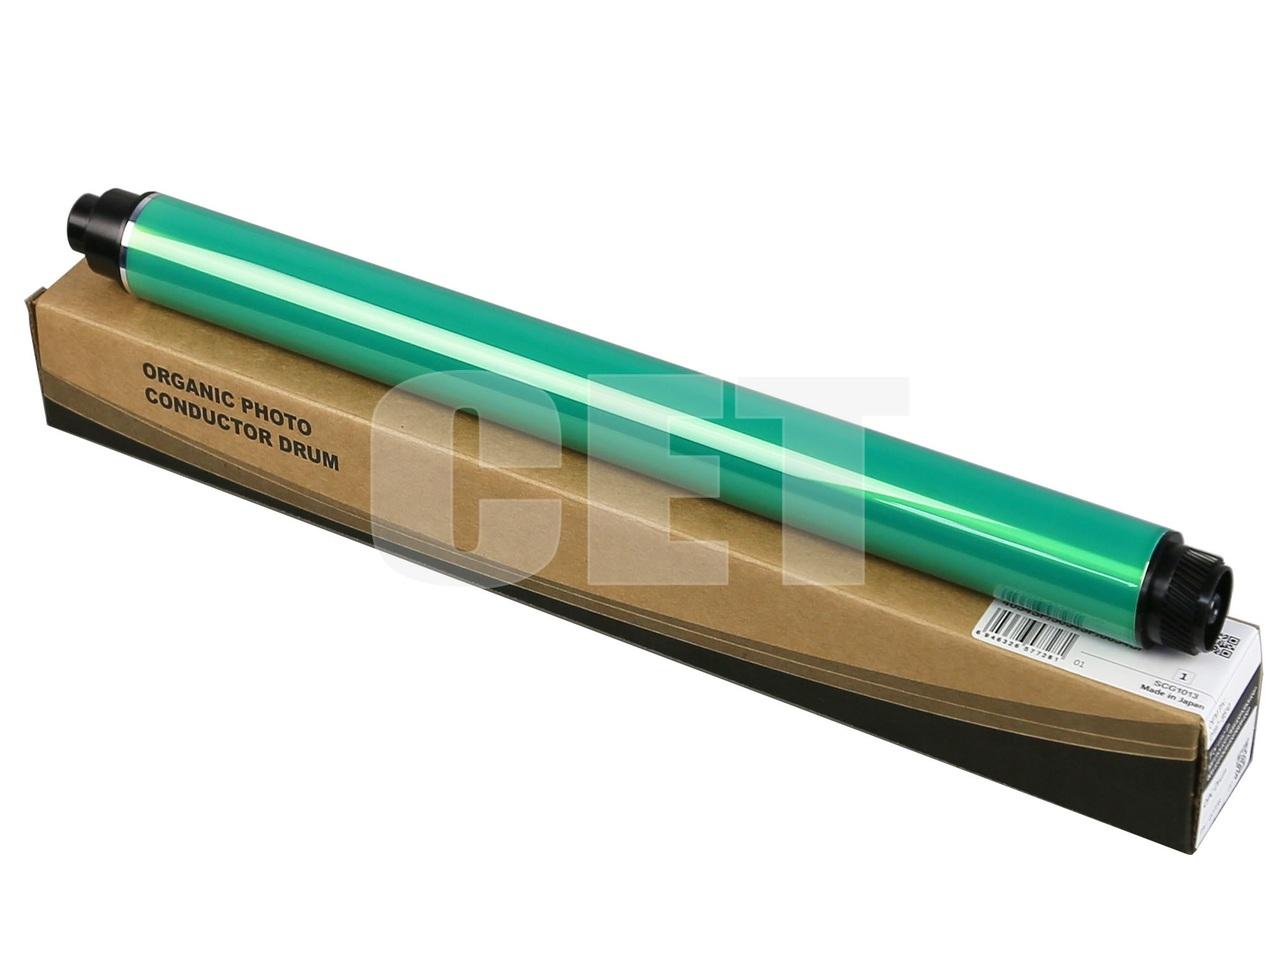 Барабан D197-9510 для RICOHMP2554SP/3054SP/4054SP/5054SP/6054SP (CET), 100000 стр.,CET7728